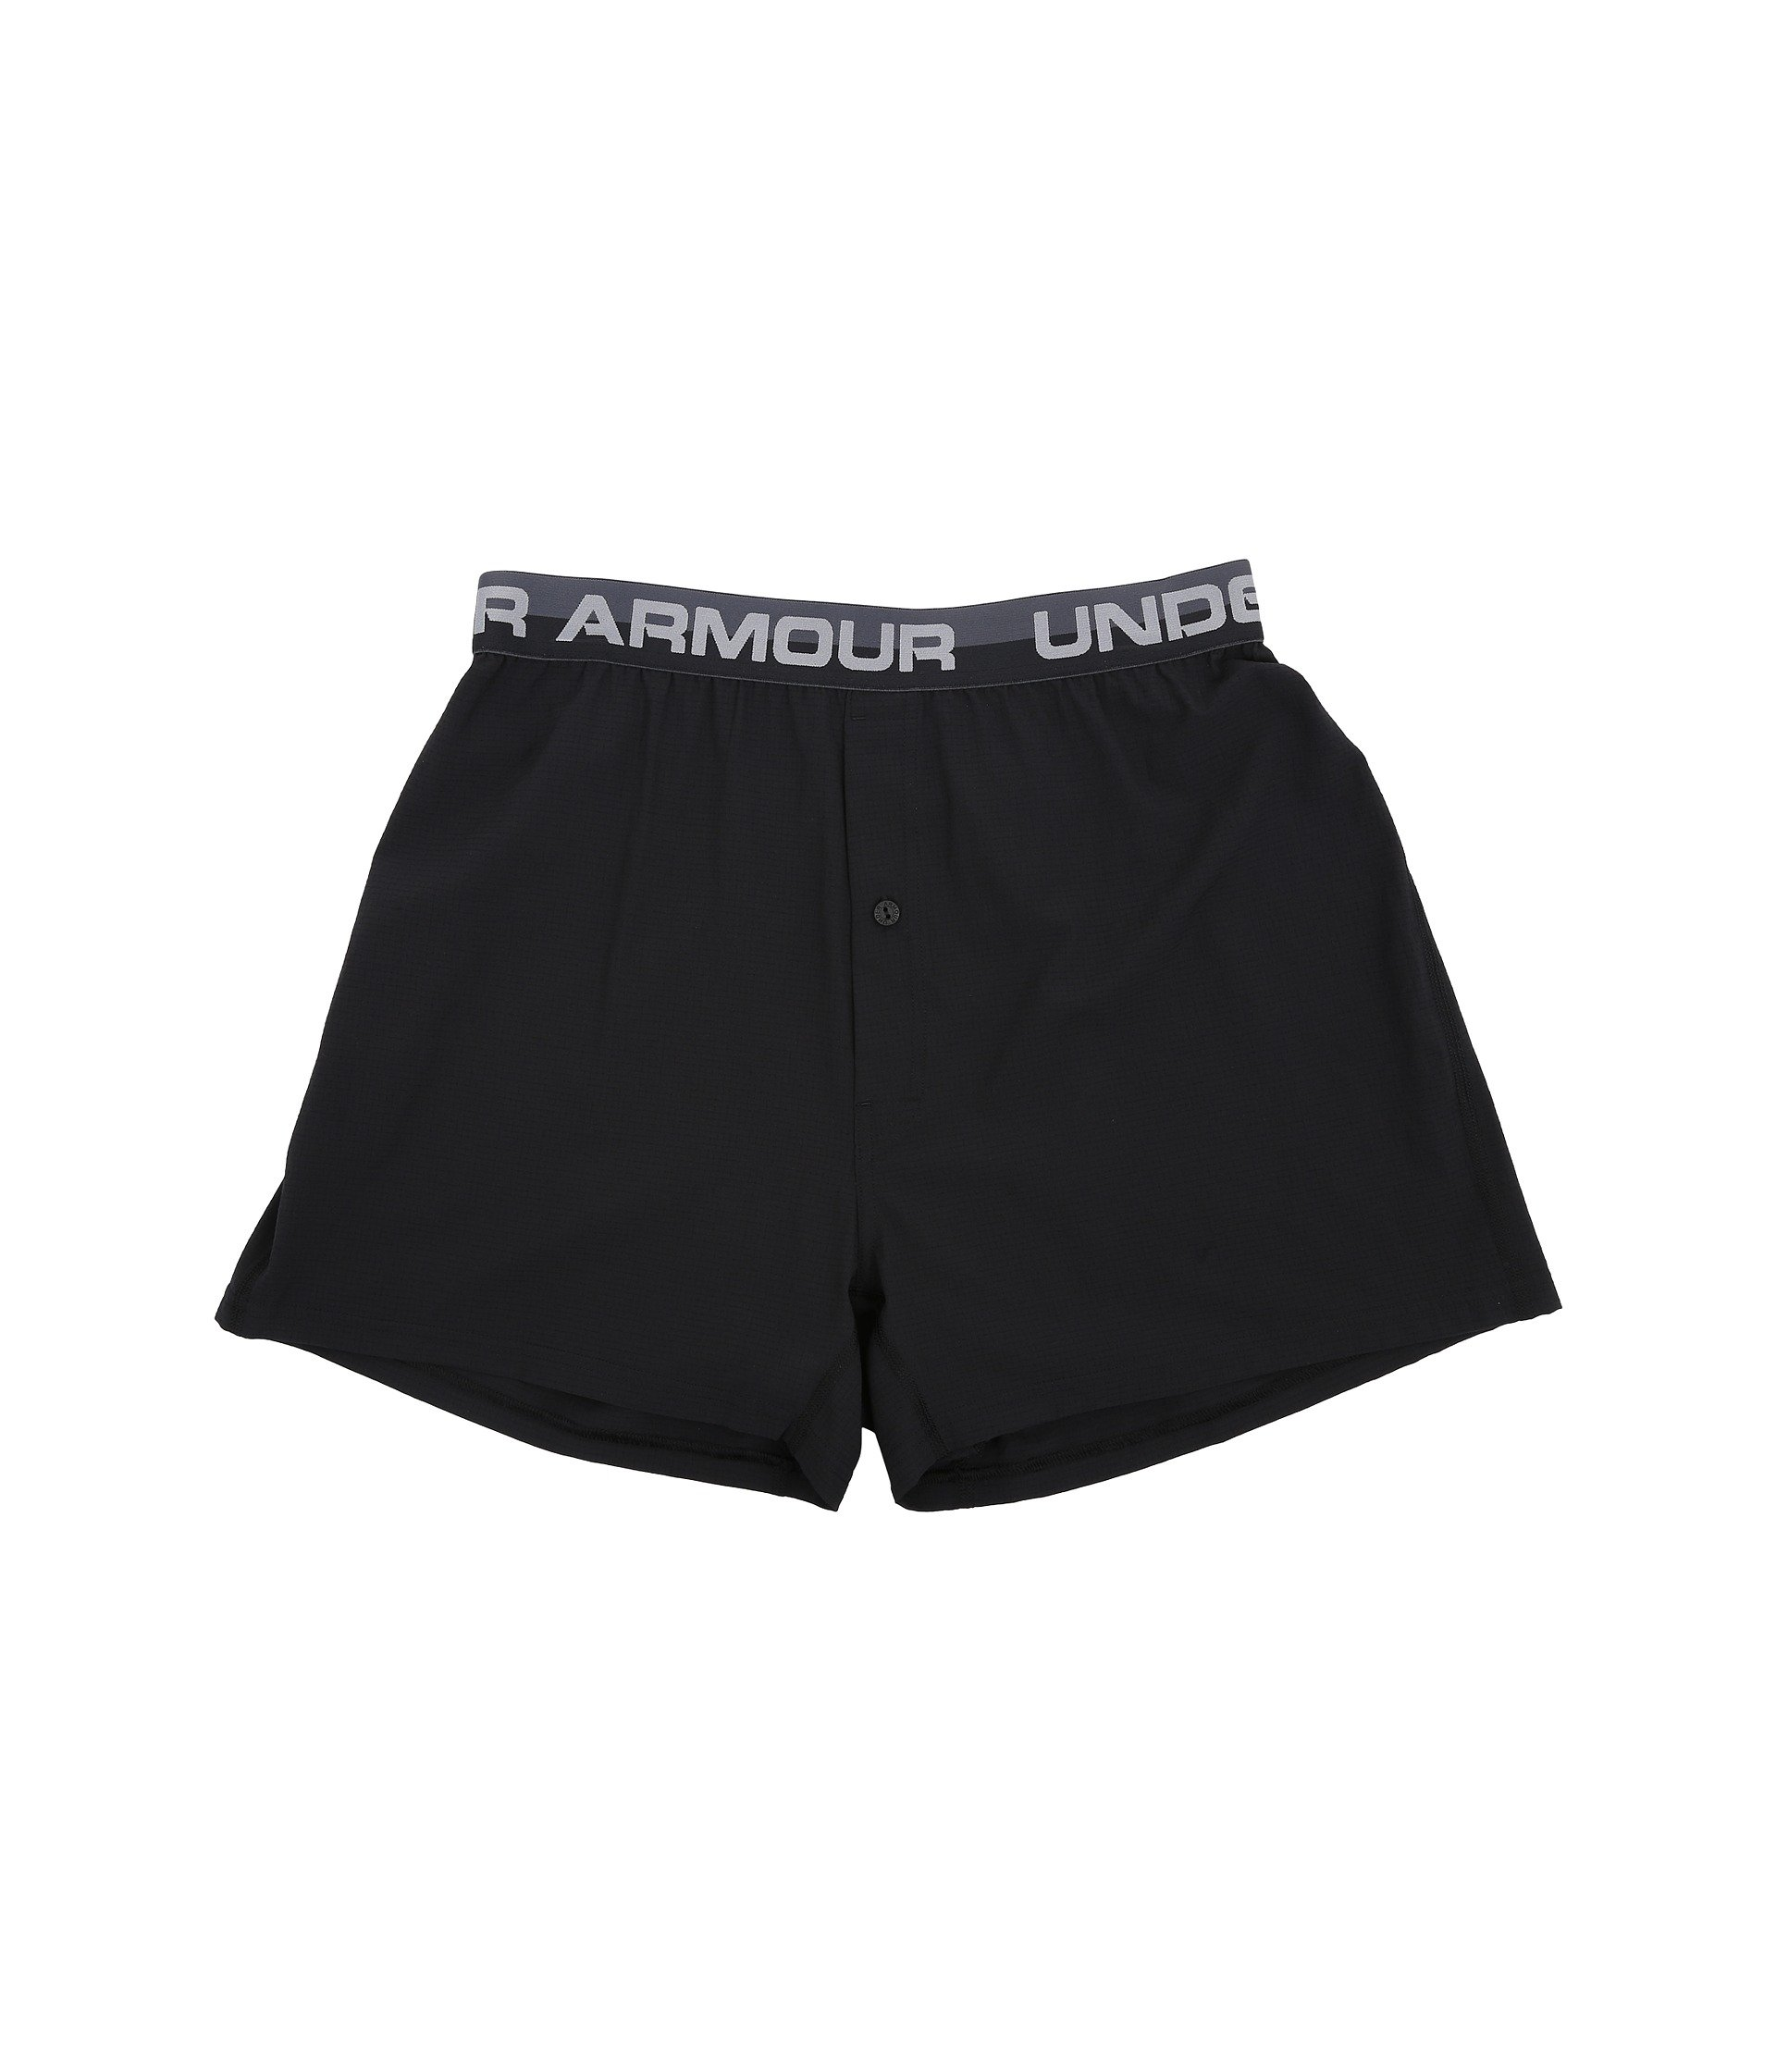 Ropa Interior para Hombre Under Armour UA Airvent Woven Boxer Shorts  + Under Armour en VeoyCompro.net